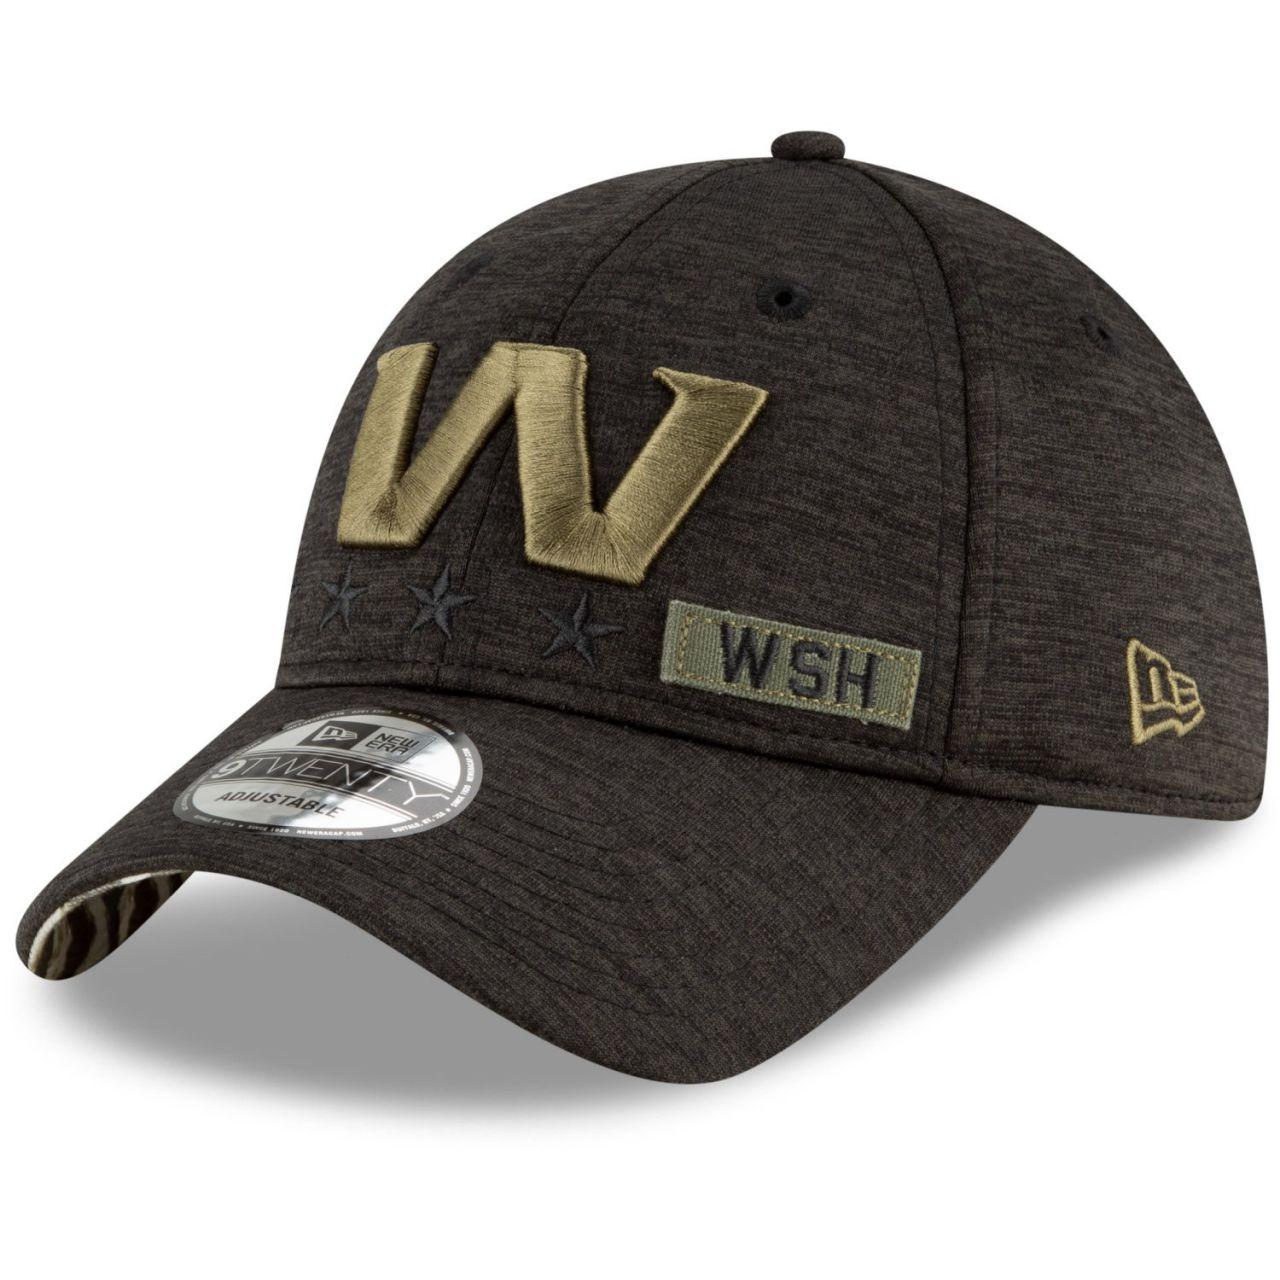 amfoo - New Era 9TWENTY Cap Salute to Service Washington Team